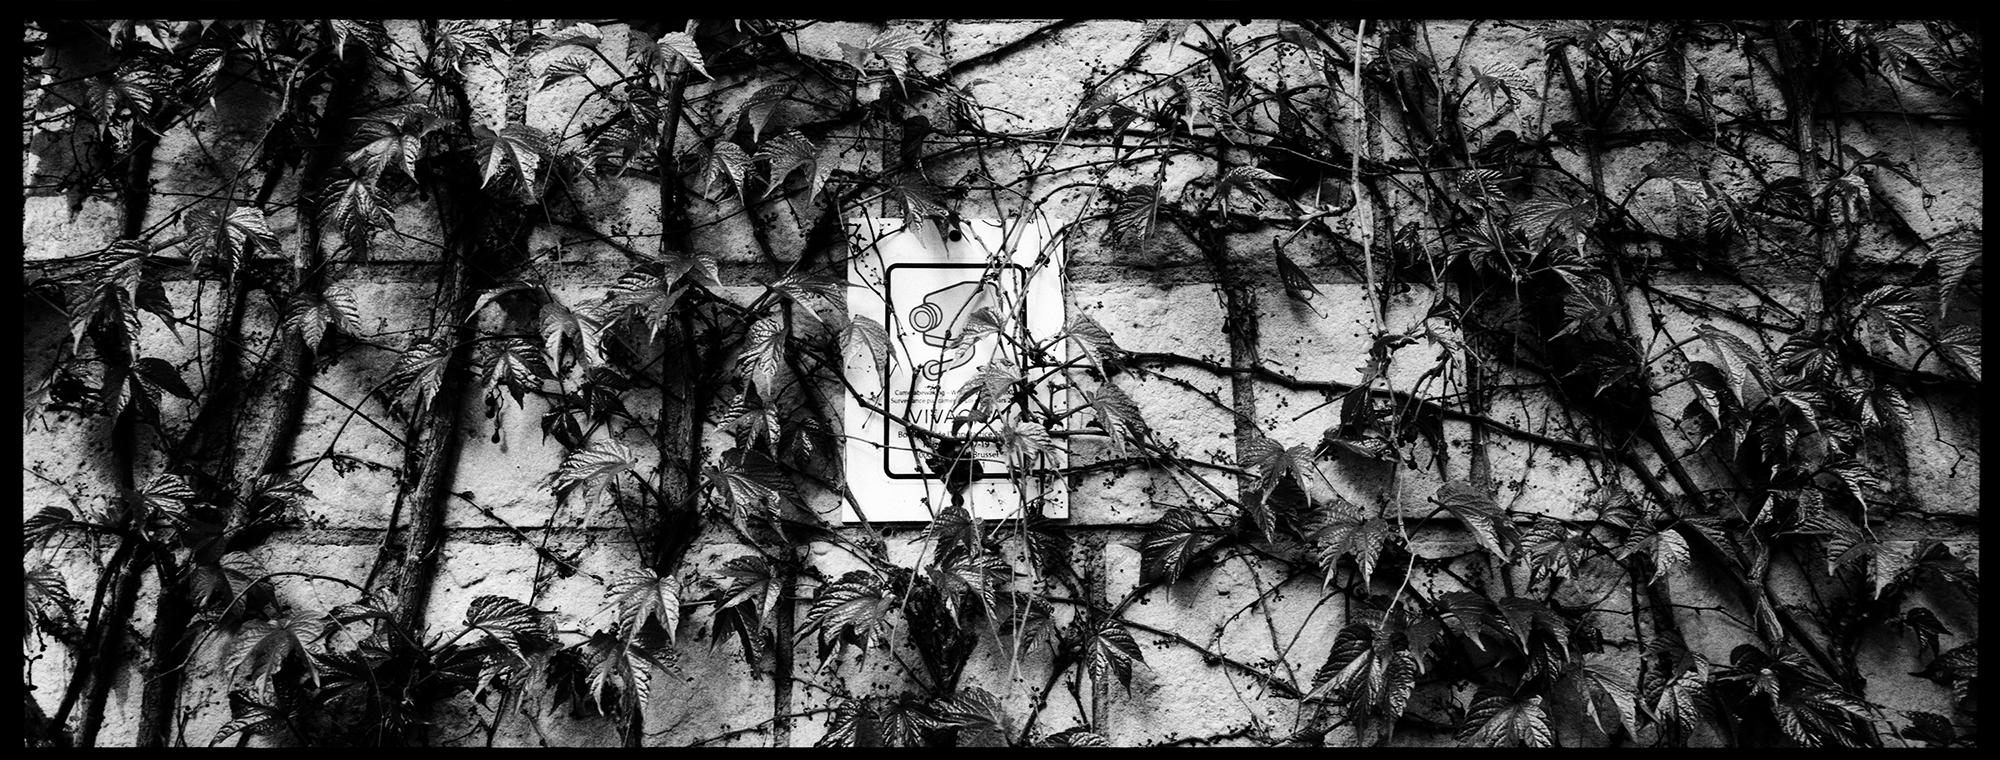 Trees, Plants, Flowers... by Laurent Orseau #144